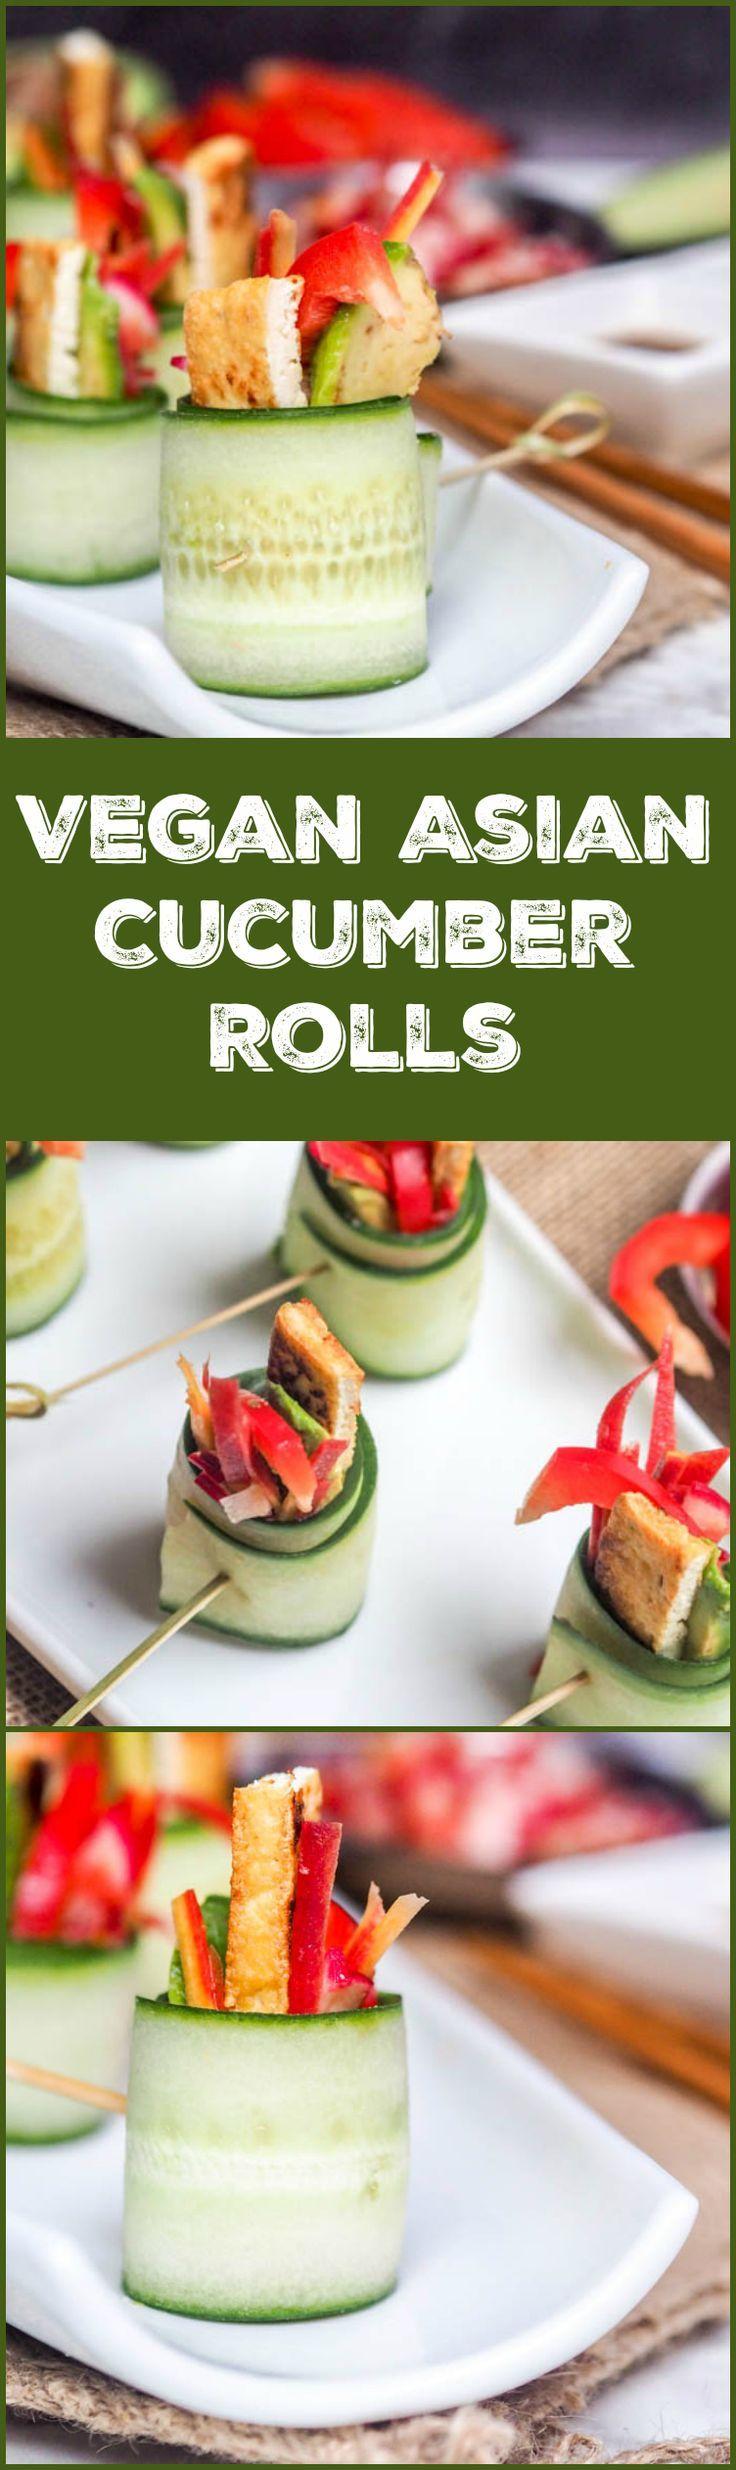 Cucumber Appetizers Vegan Asian Cucumber Rolls Gluten Free Recipe Cucumber Rolls Vegan Asian Appetizers